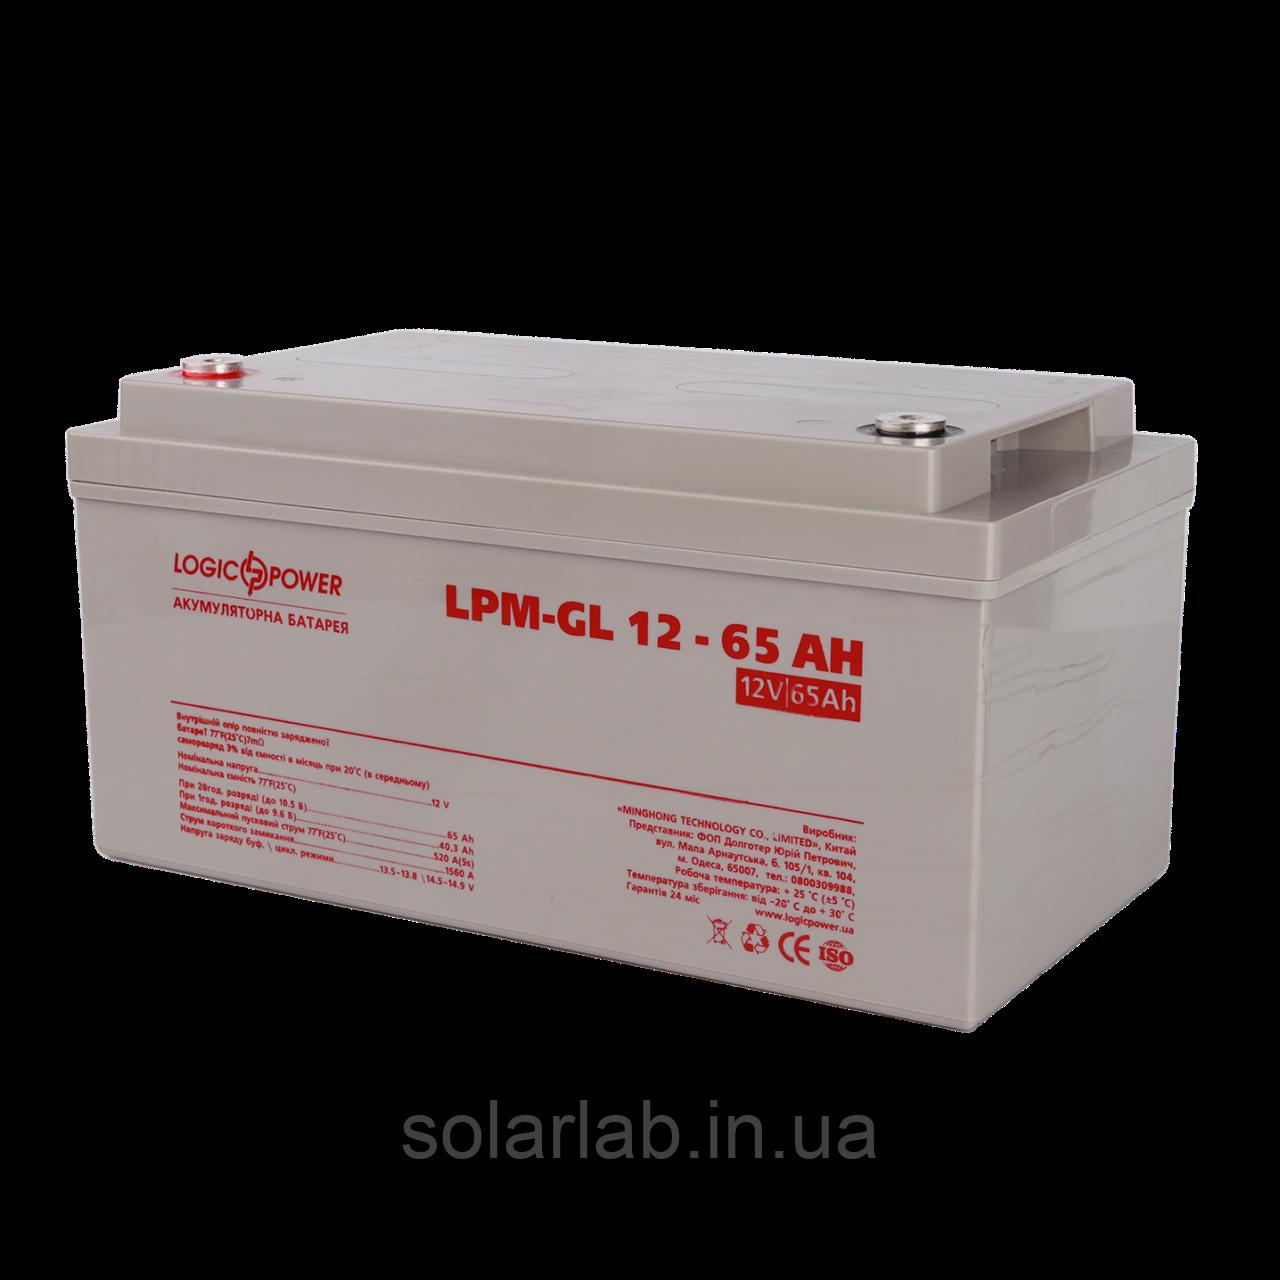 Акумулятор гелевий LPU-GL 12 - 65 AH